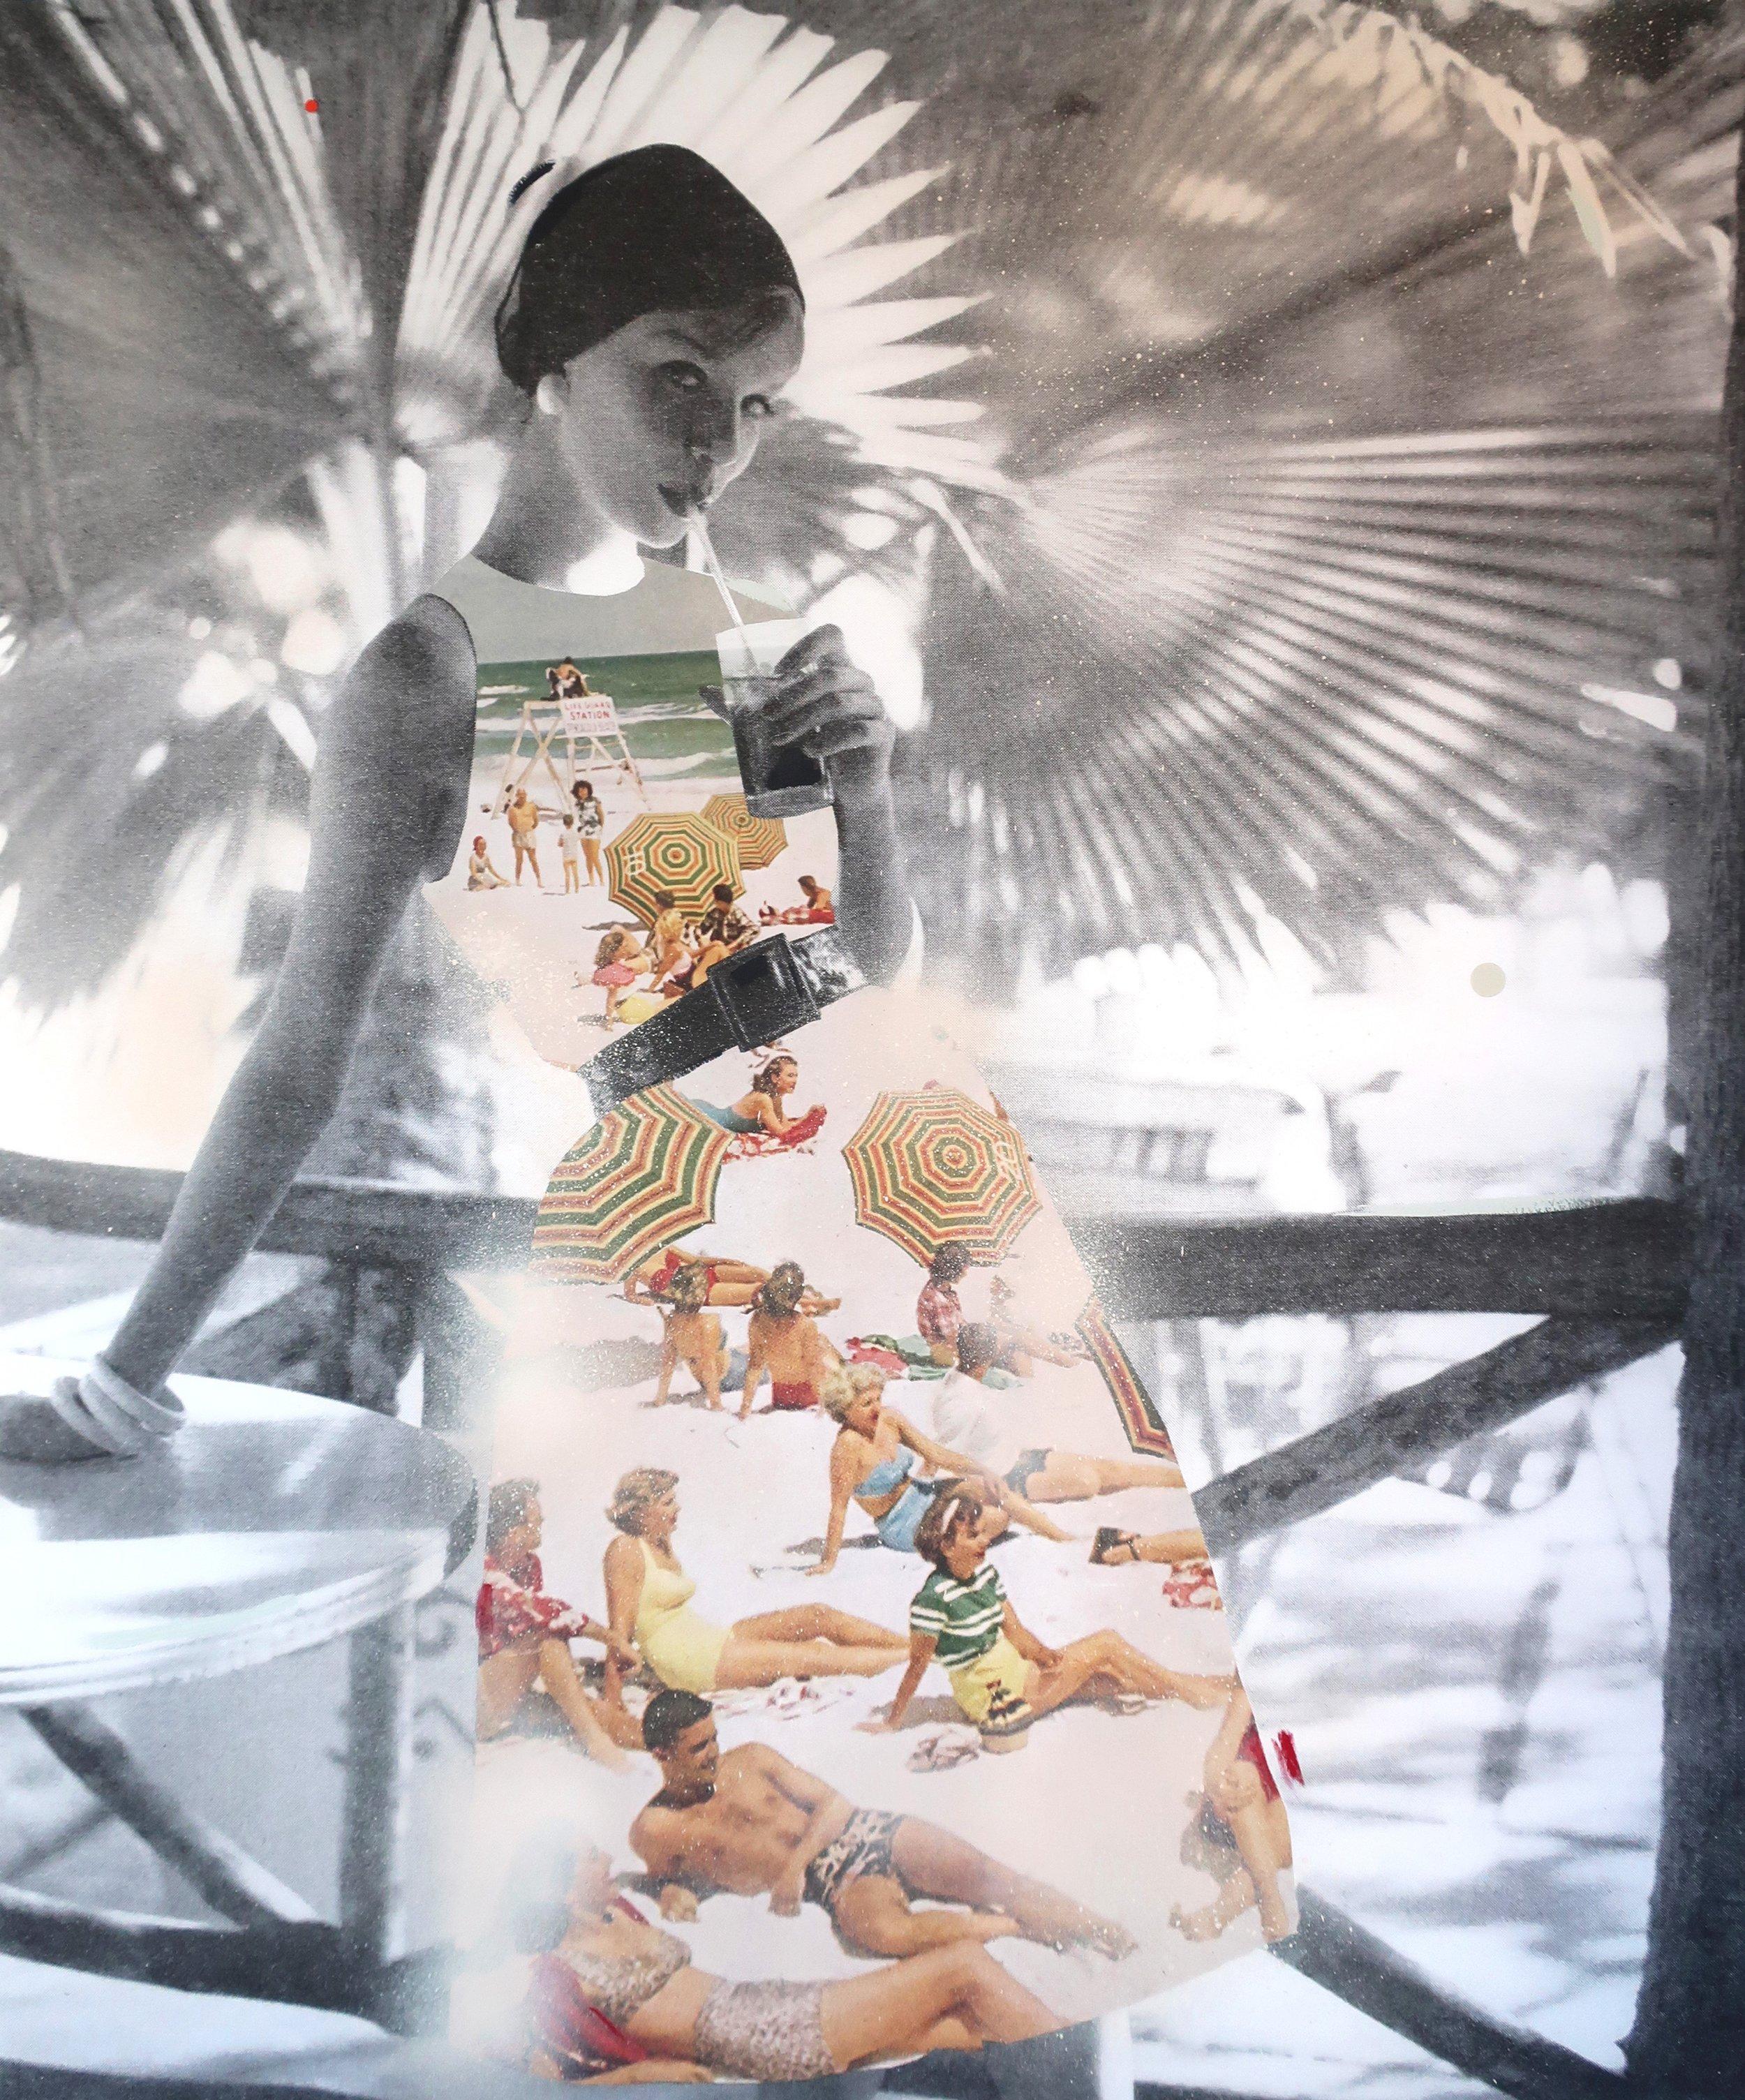 ROMAN FINE ART, Lizzie Gill, Summer Solstice II, 2019, Unigue hand embellished print on Hanemuhle paper, 40x35in.jpg